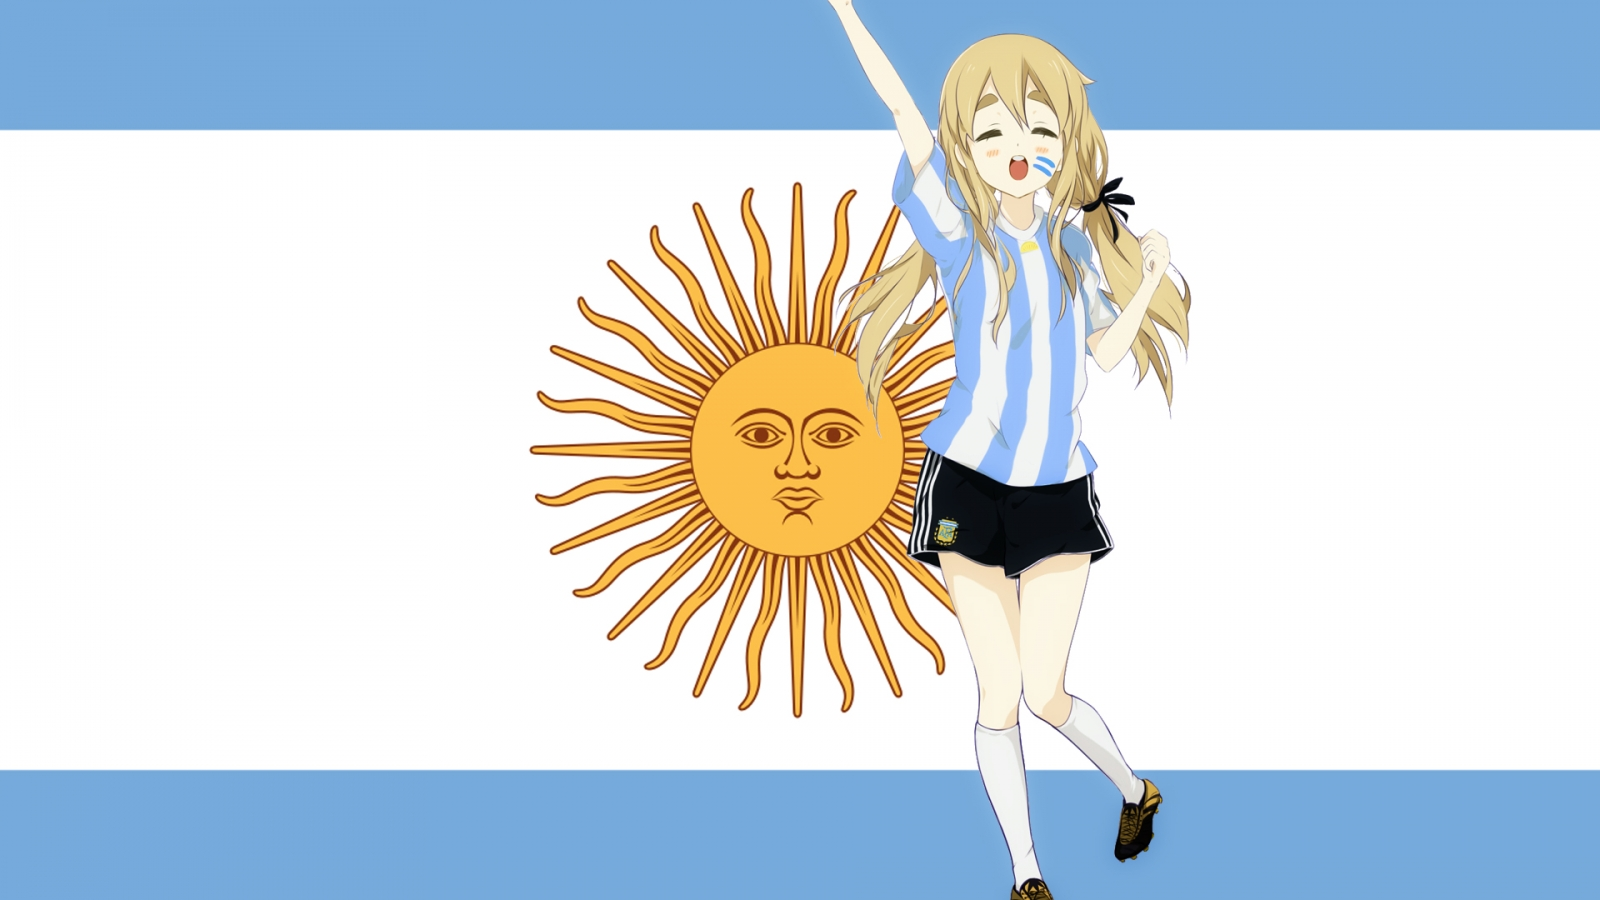 Chica K-ON de Argentina - 1600x900